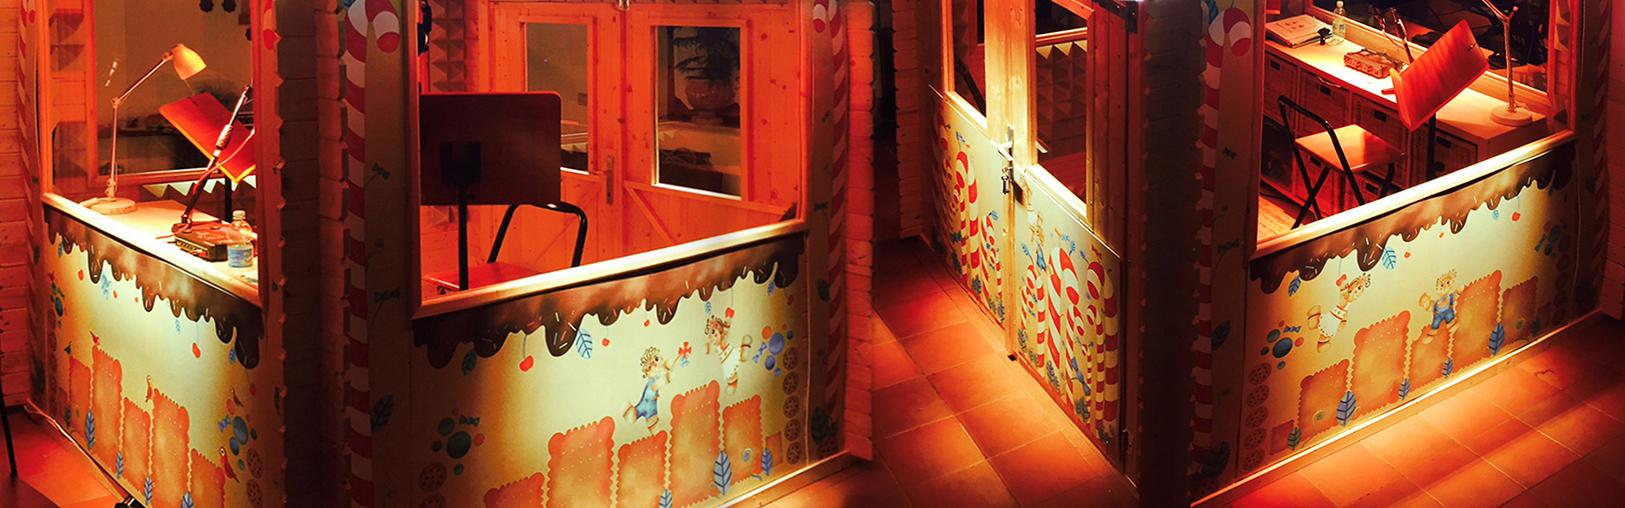 Double Arhc:la Casa Zuccherosa